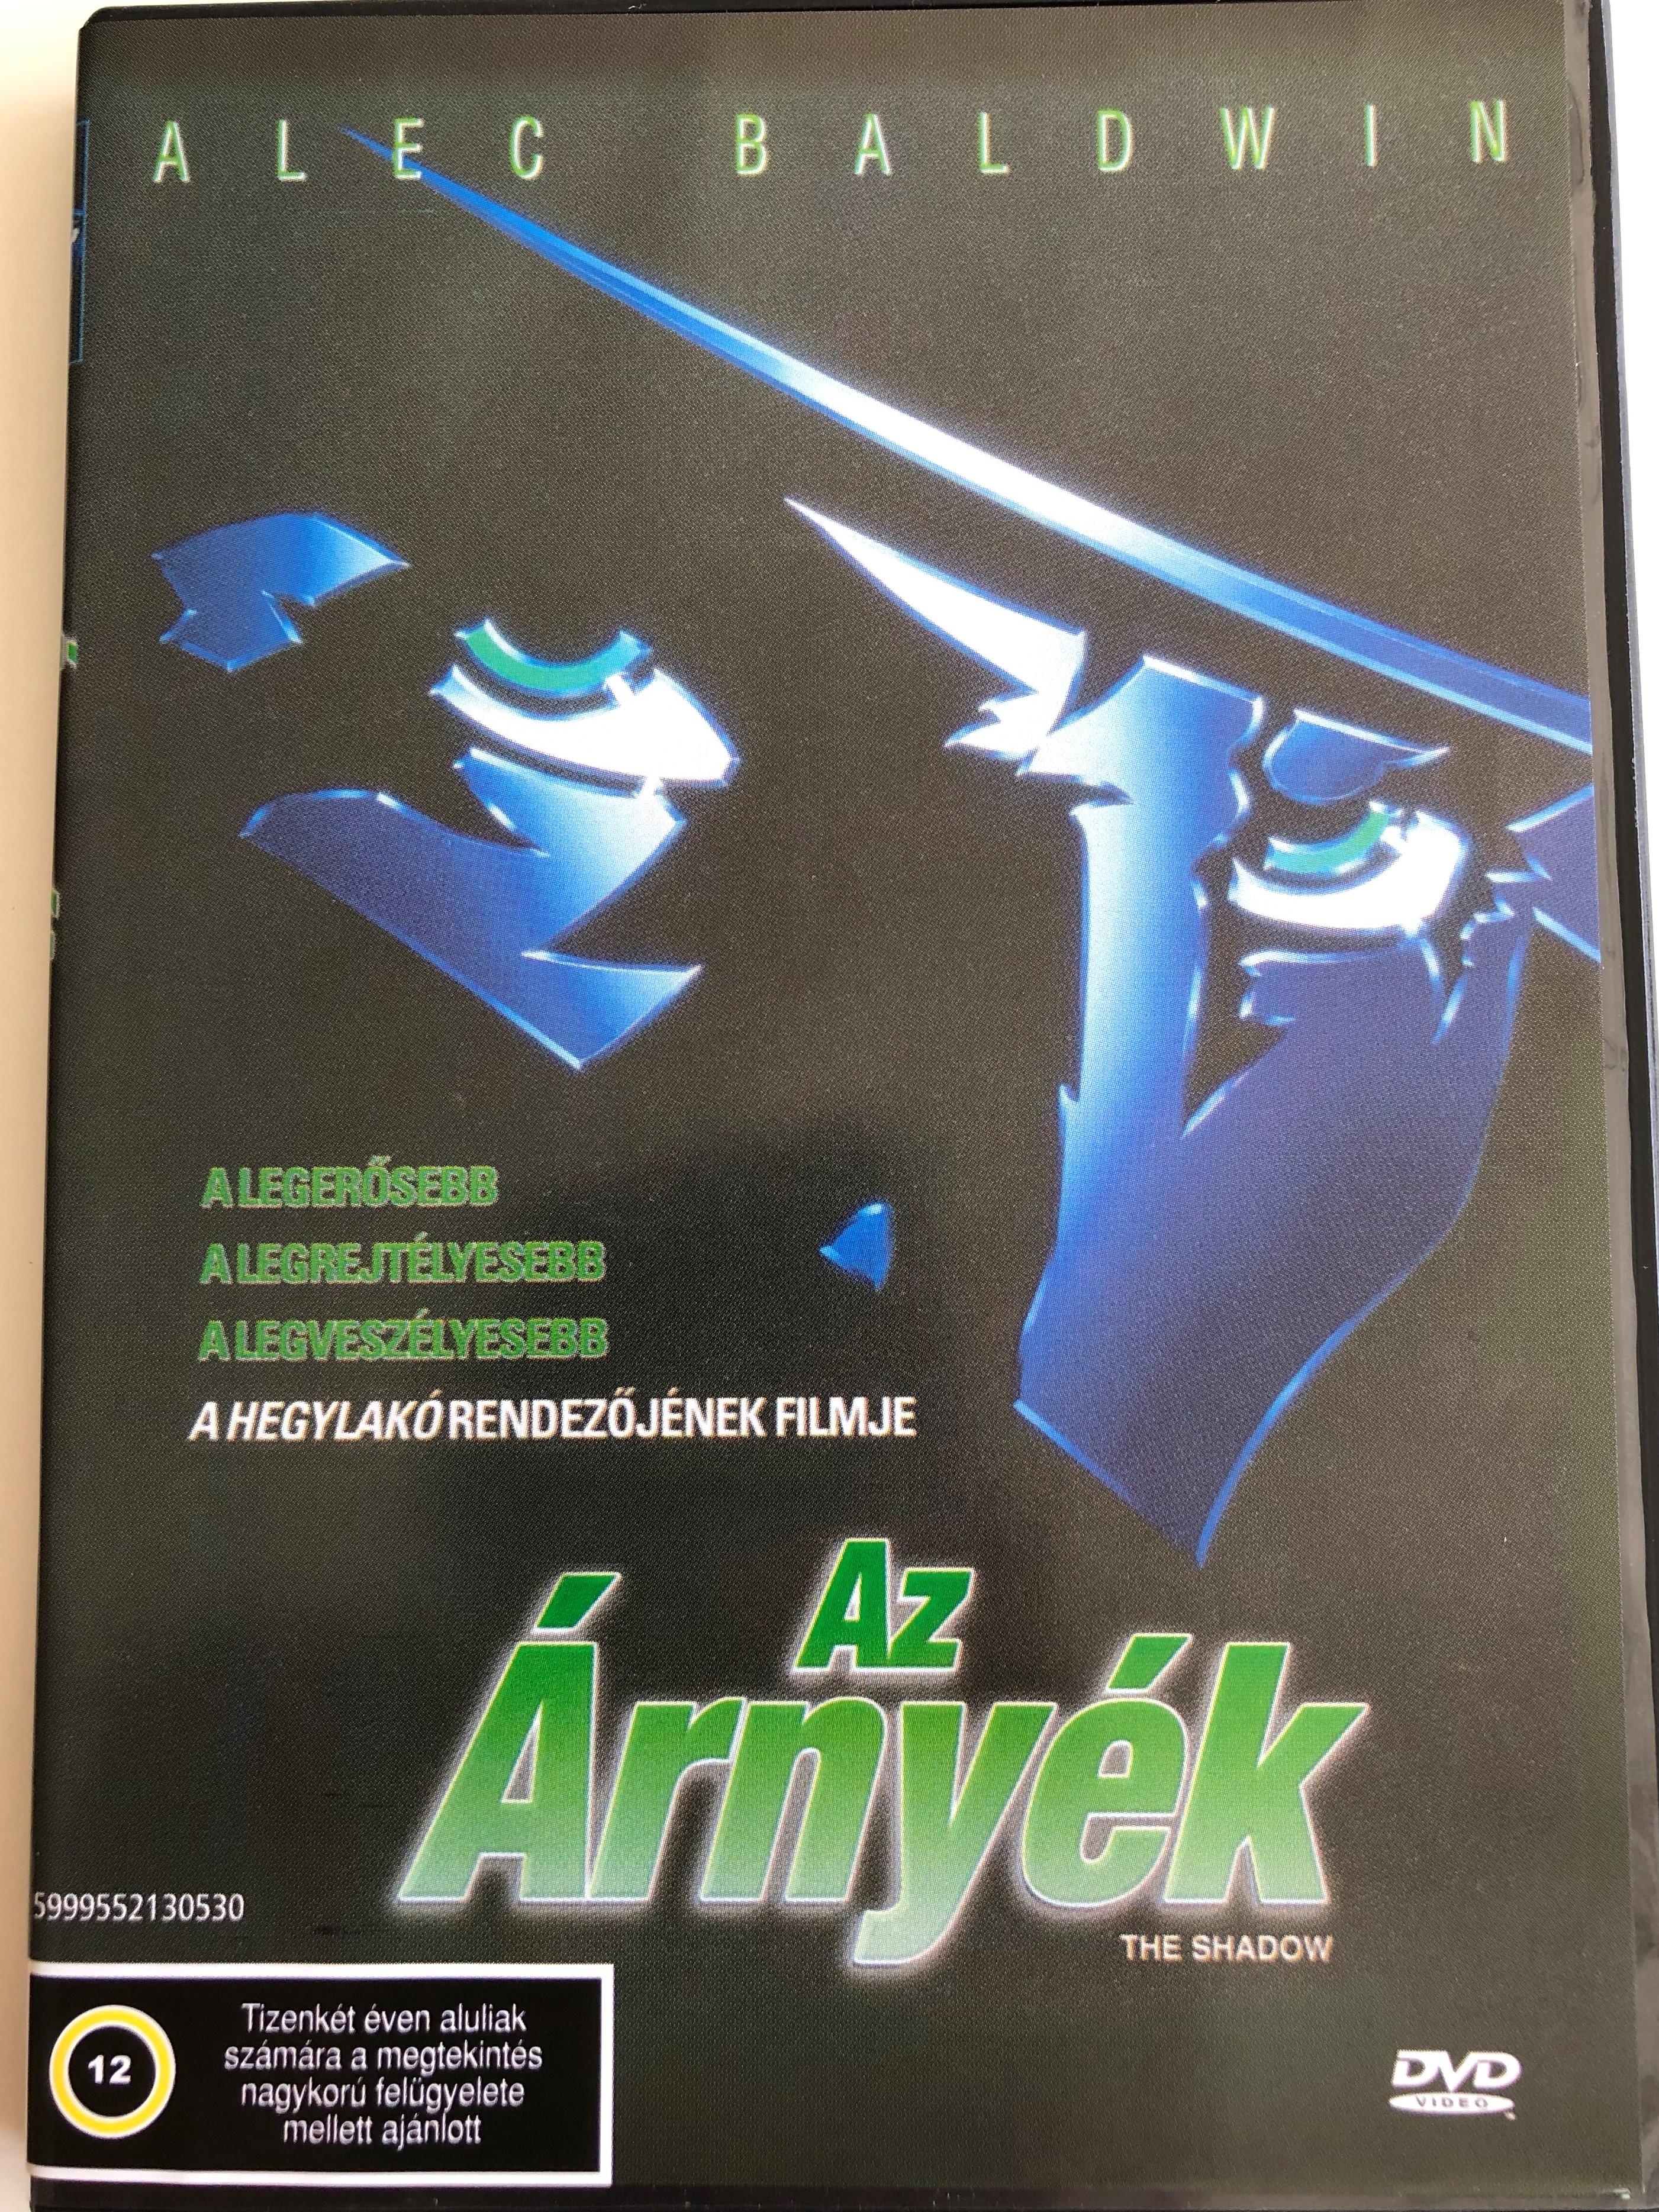 the-shadow-dvd-1994-az-rny-k-directed-by-russell-mulcahy-starring-alec-baldwin-john-lone-penelope-ann-miller-peter-boyle-ian-mckellen-jonathan-winters-tim-curry-1-.jpg